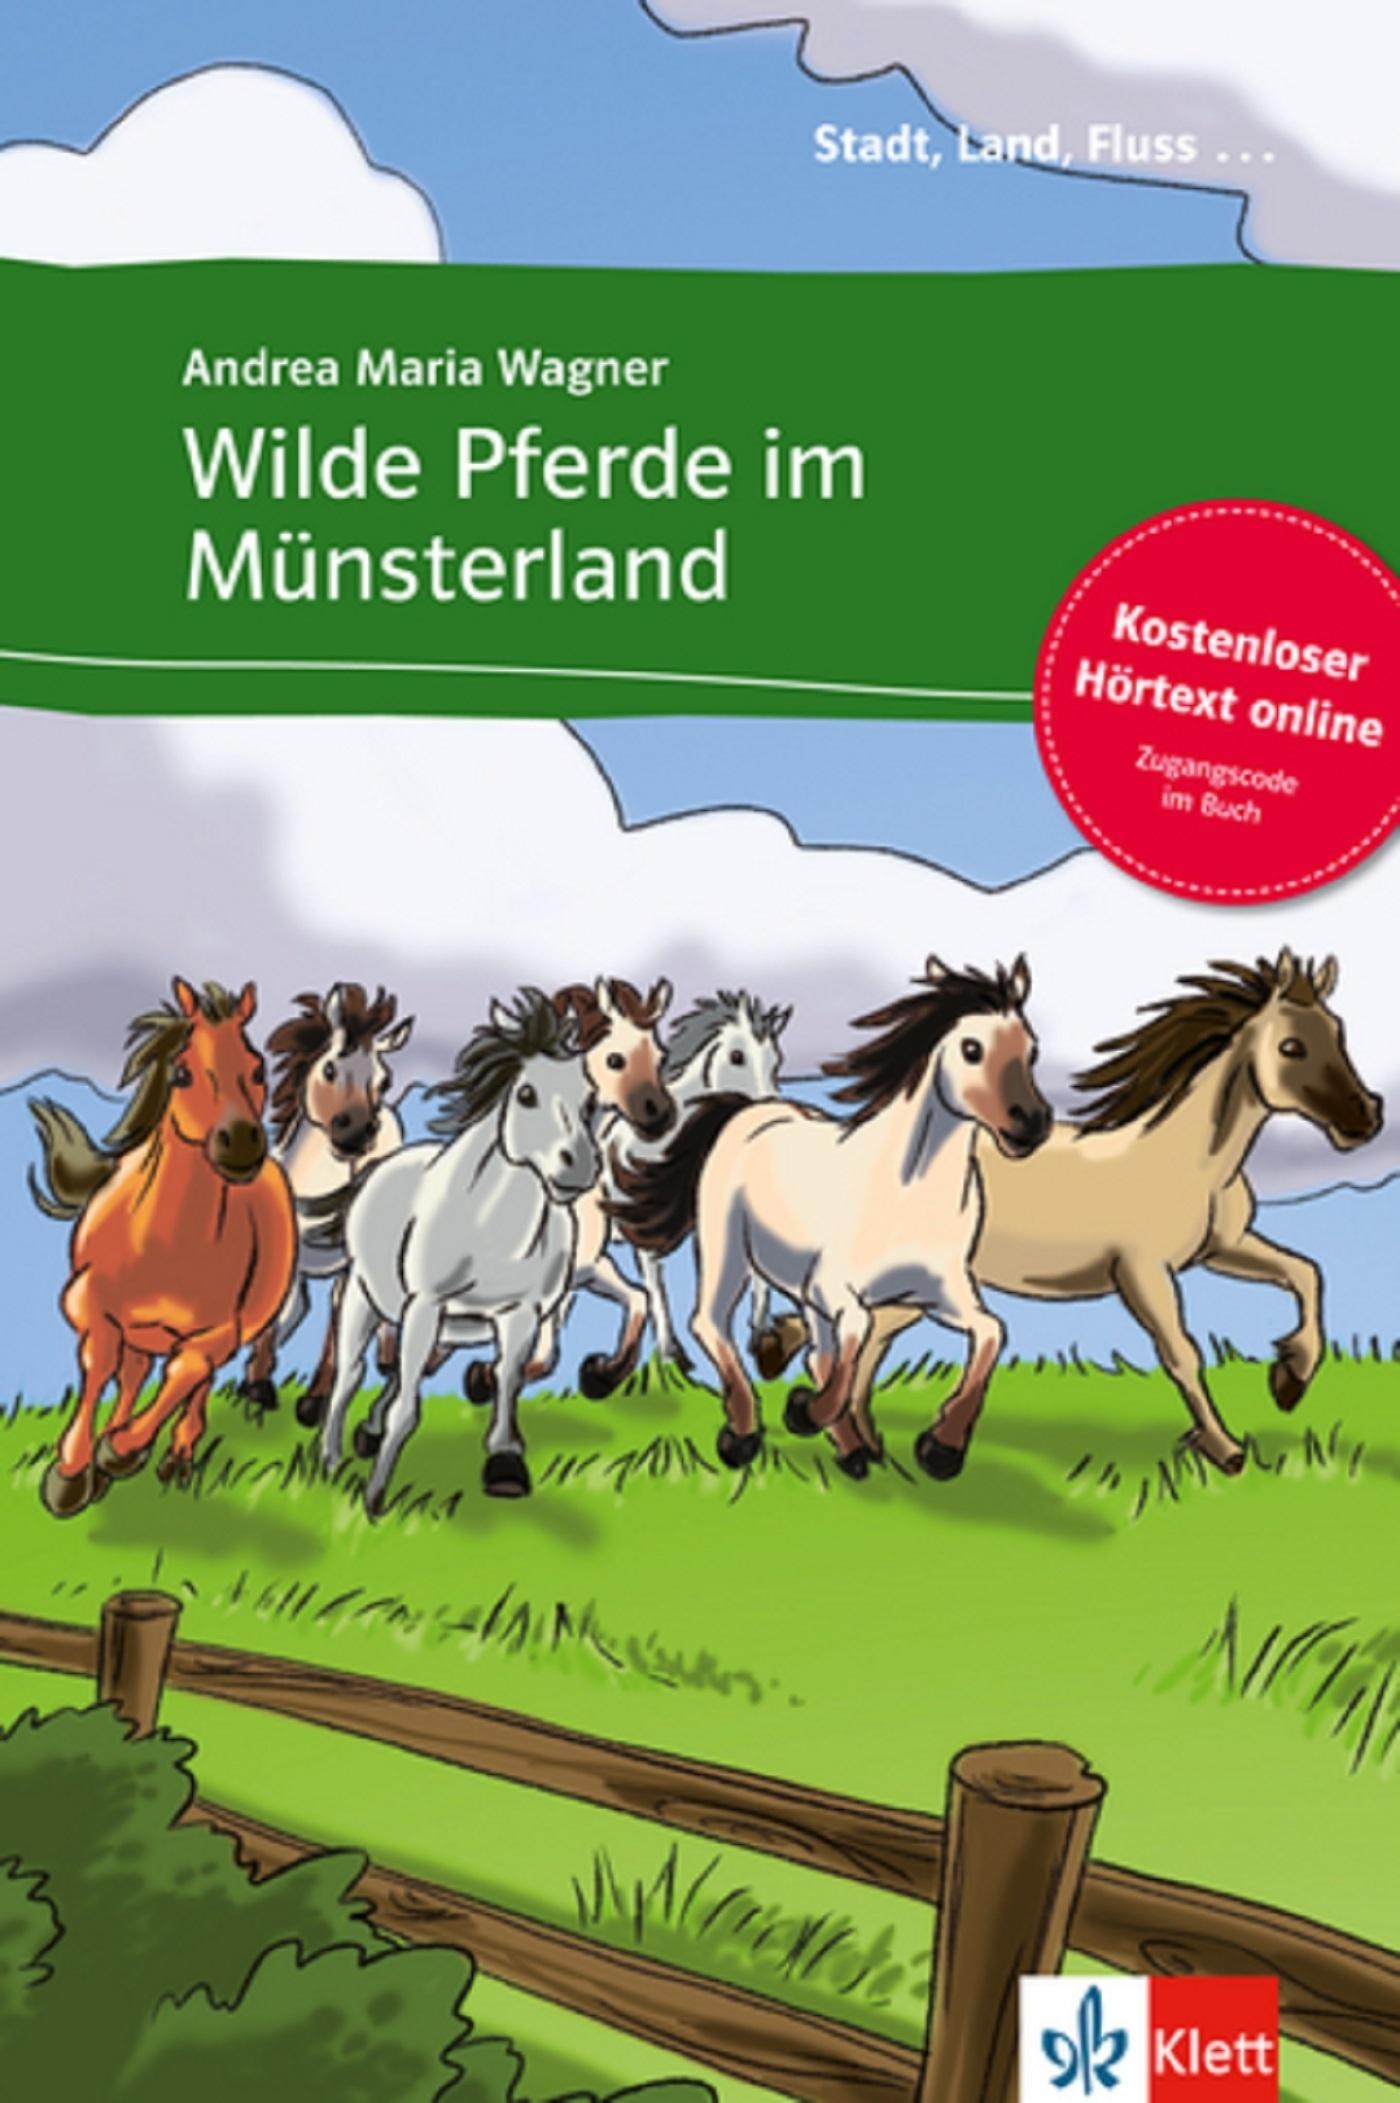 WILDE PFERDE IM MUNSTERLAND + AUDIO TELECHARGEABLES